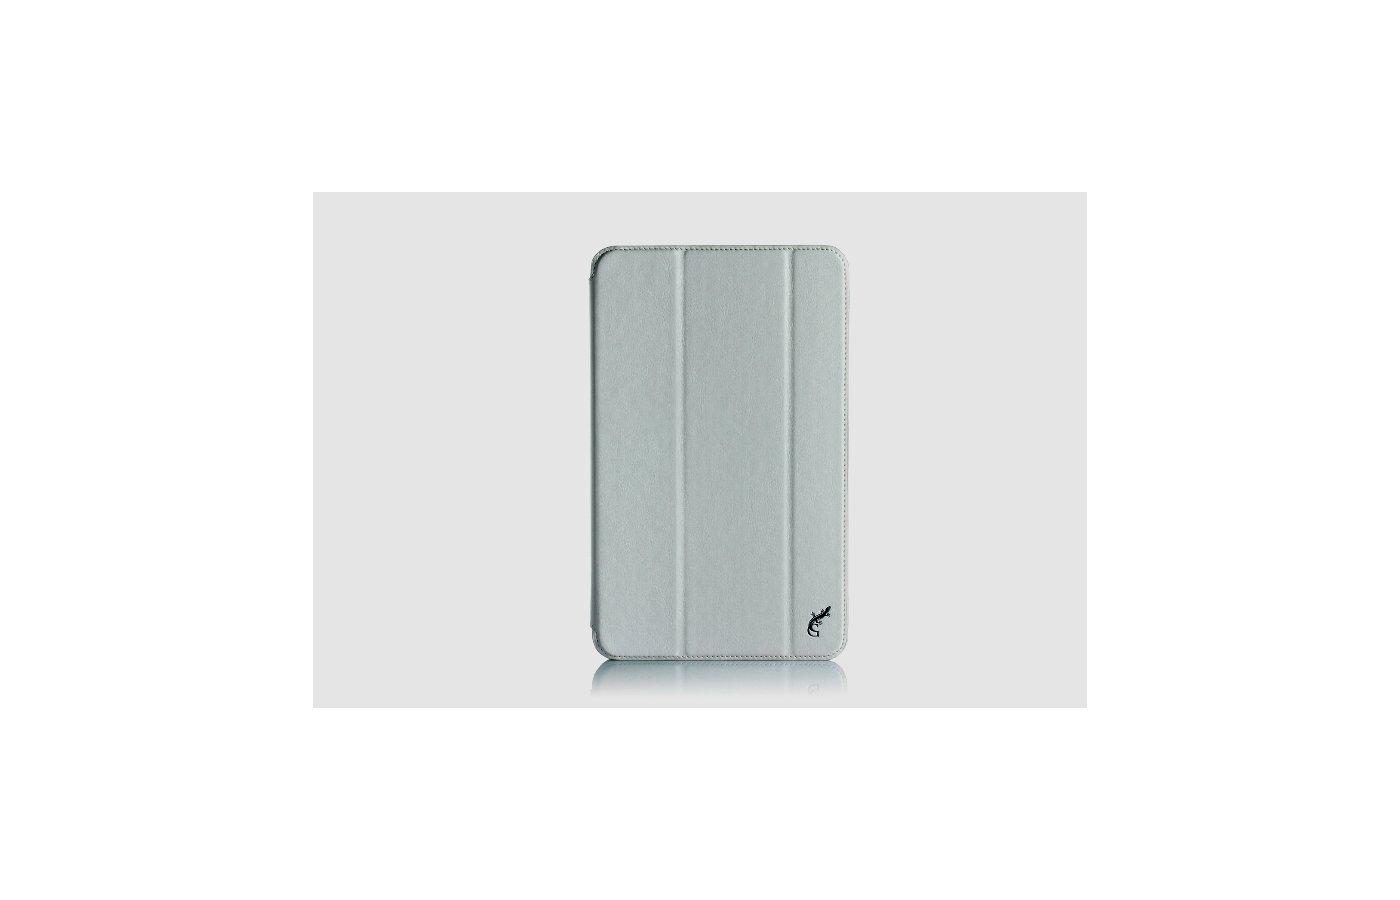 Чехол для планшетного ПК G-Case Slim Premium для Samsung Galaxy Tab A 8.0 белый